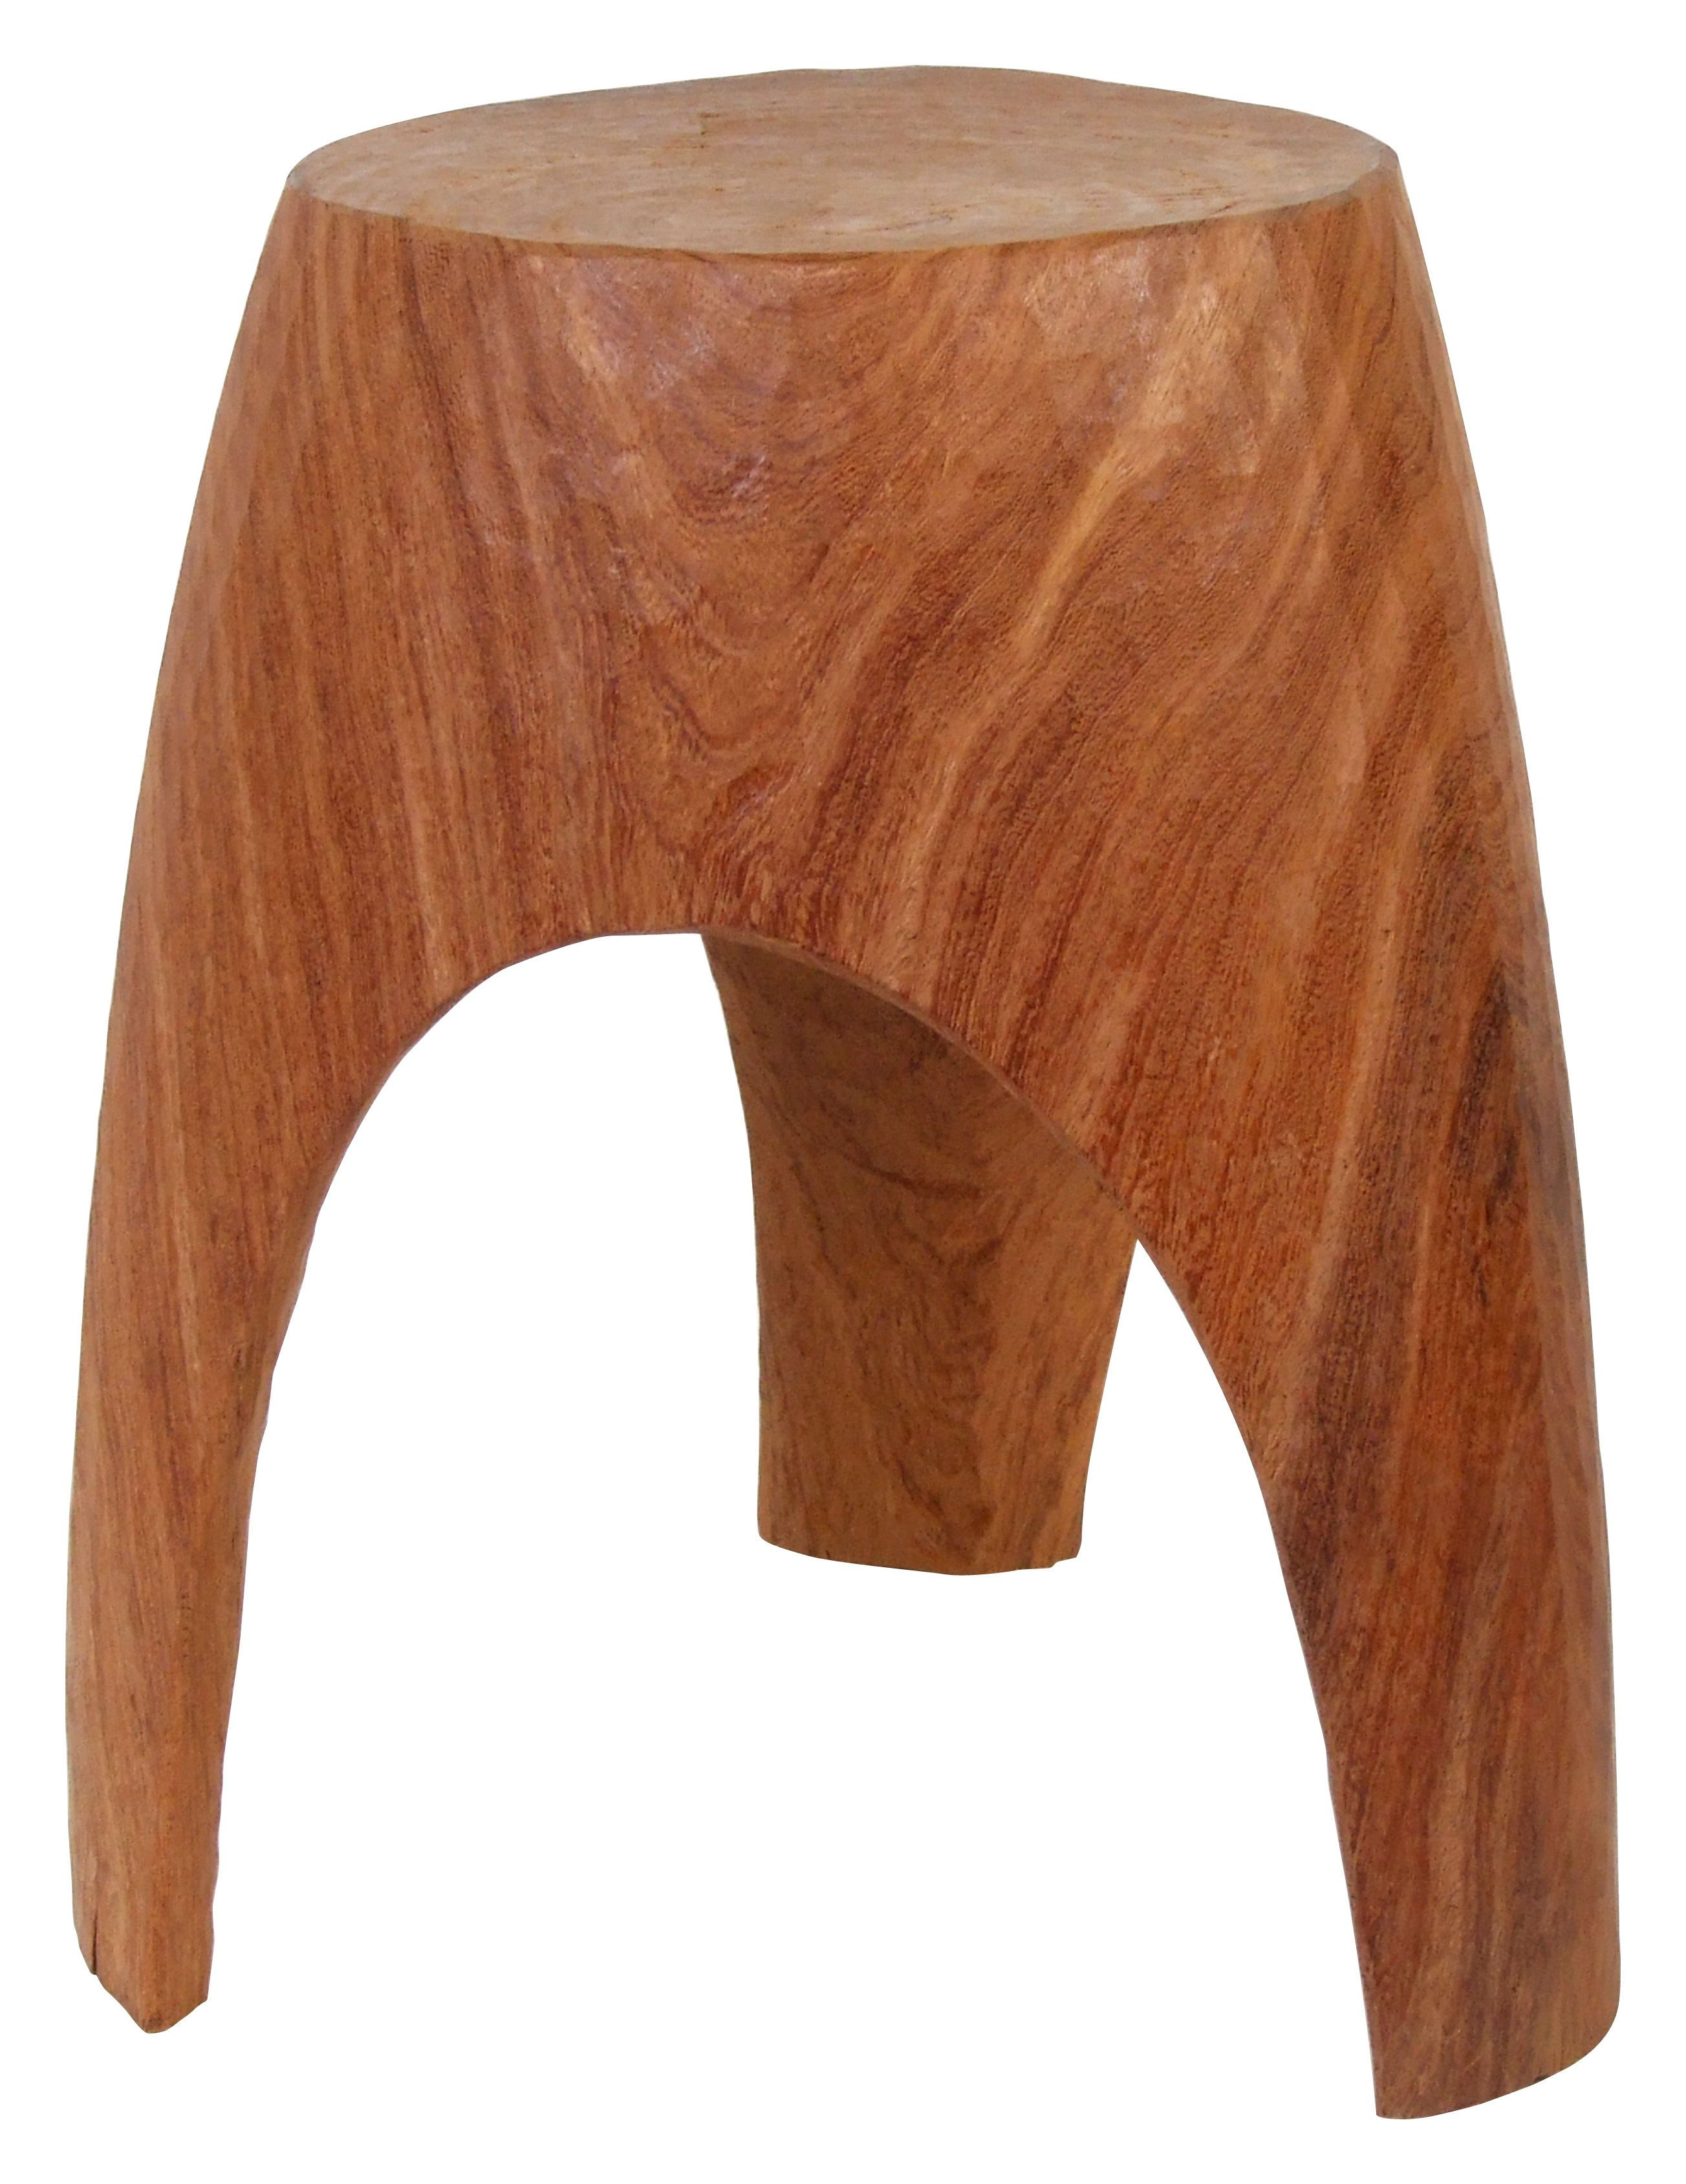 Tabouret 3 Legs Bois